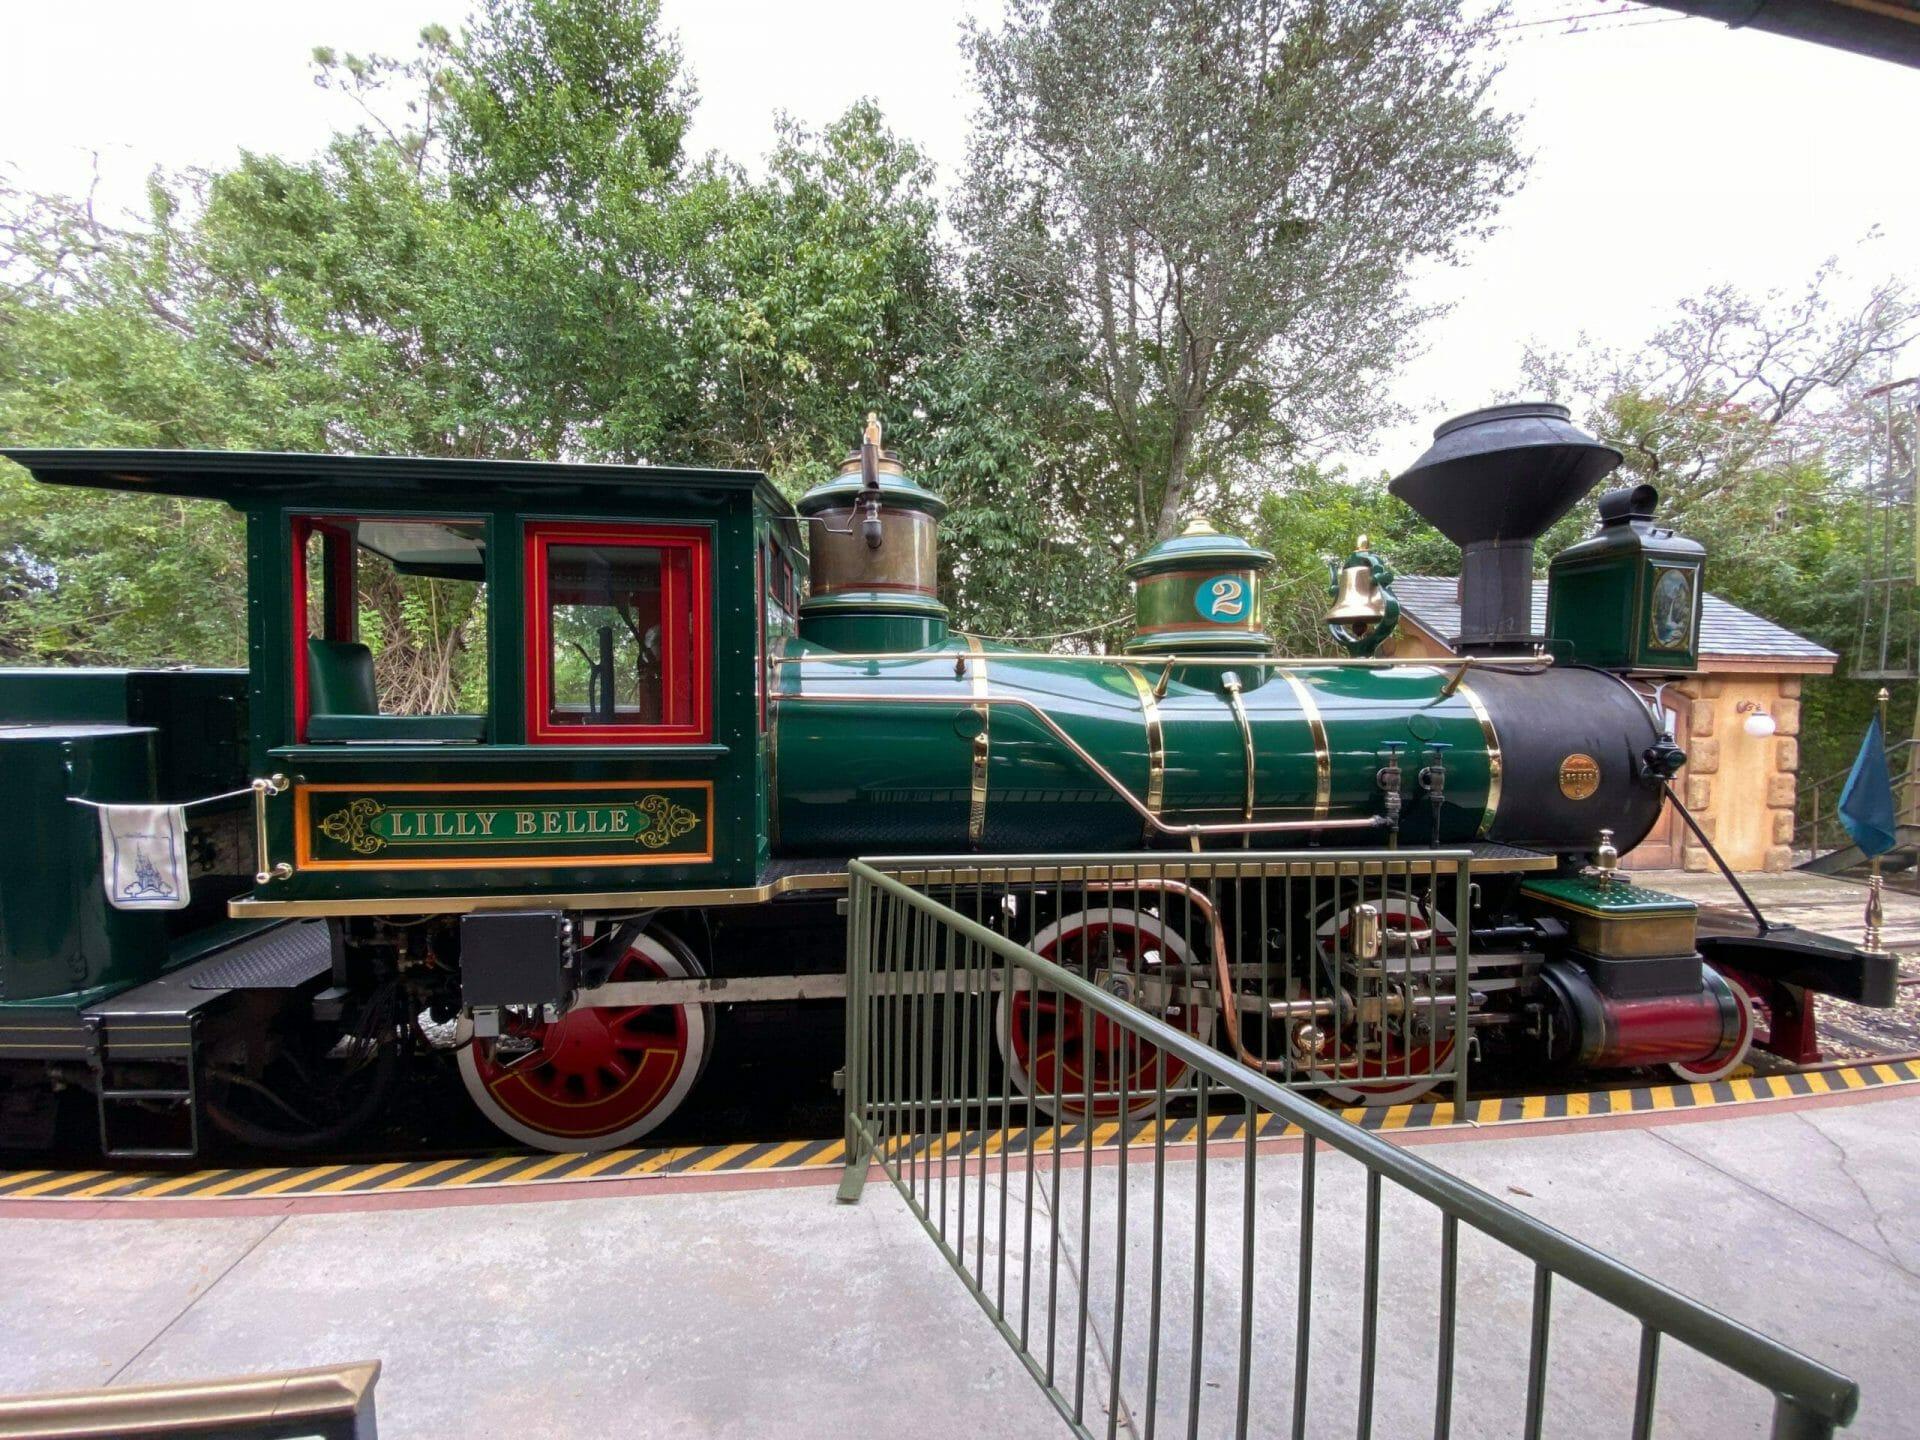 Magic Kingdom Train Photo Opp in Fantasyland